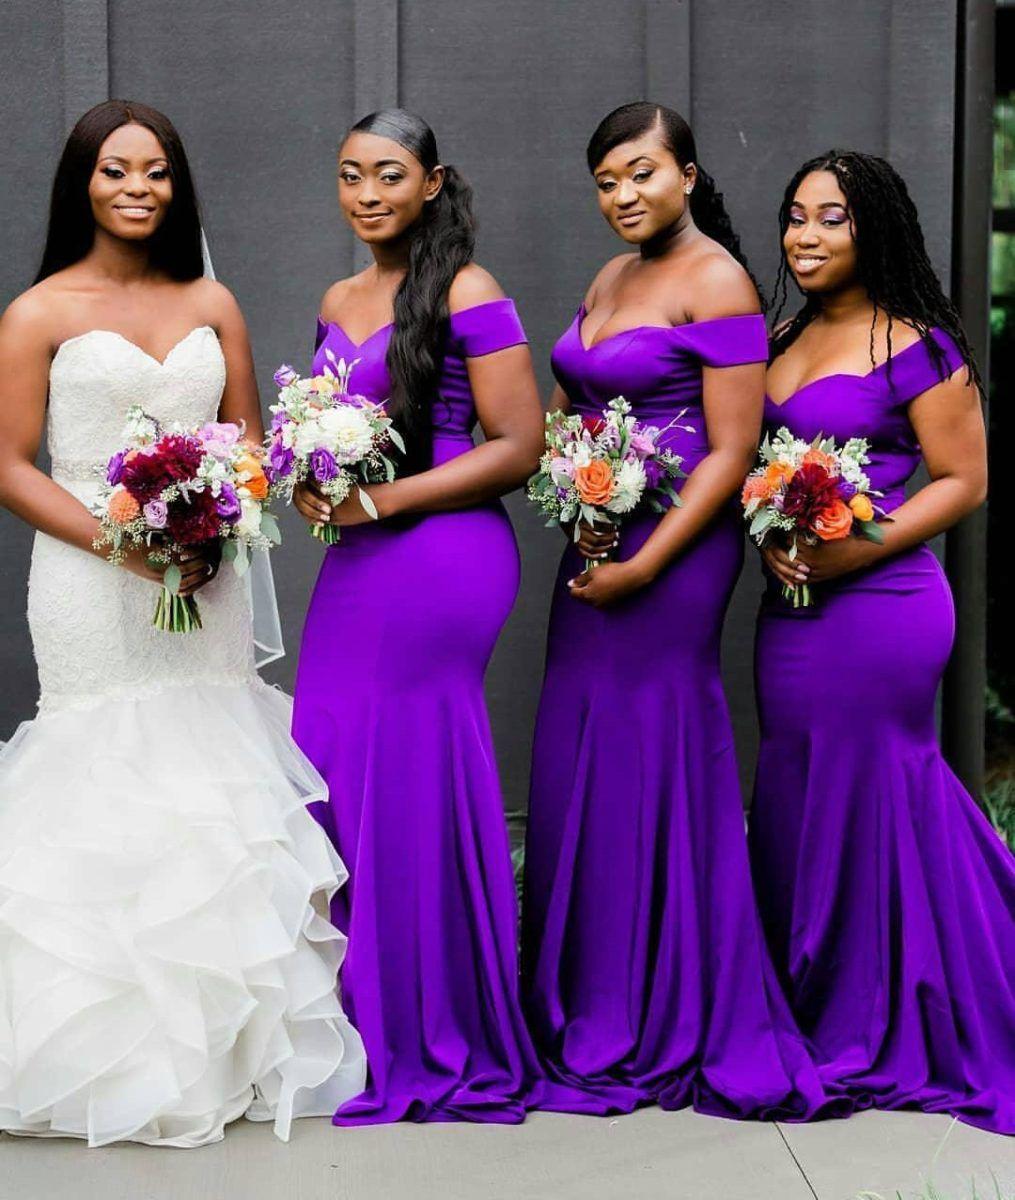 Awesome Bridal Train Wedding Dresses Looking Fabulous In 2020 Dark Purple Bridesmaid Dresses Purple Bridesmaid Dresses Bridesmaid Dresses